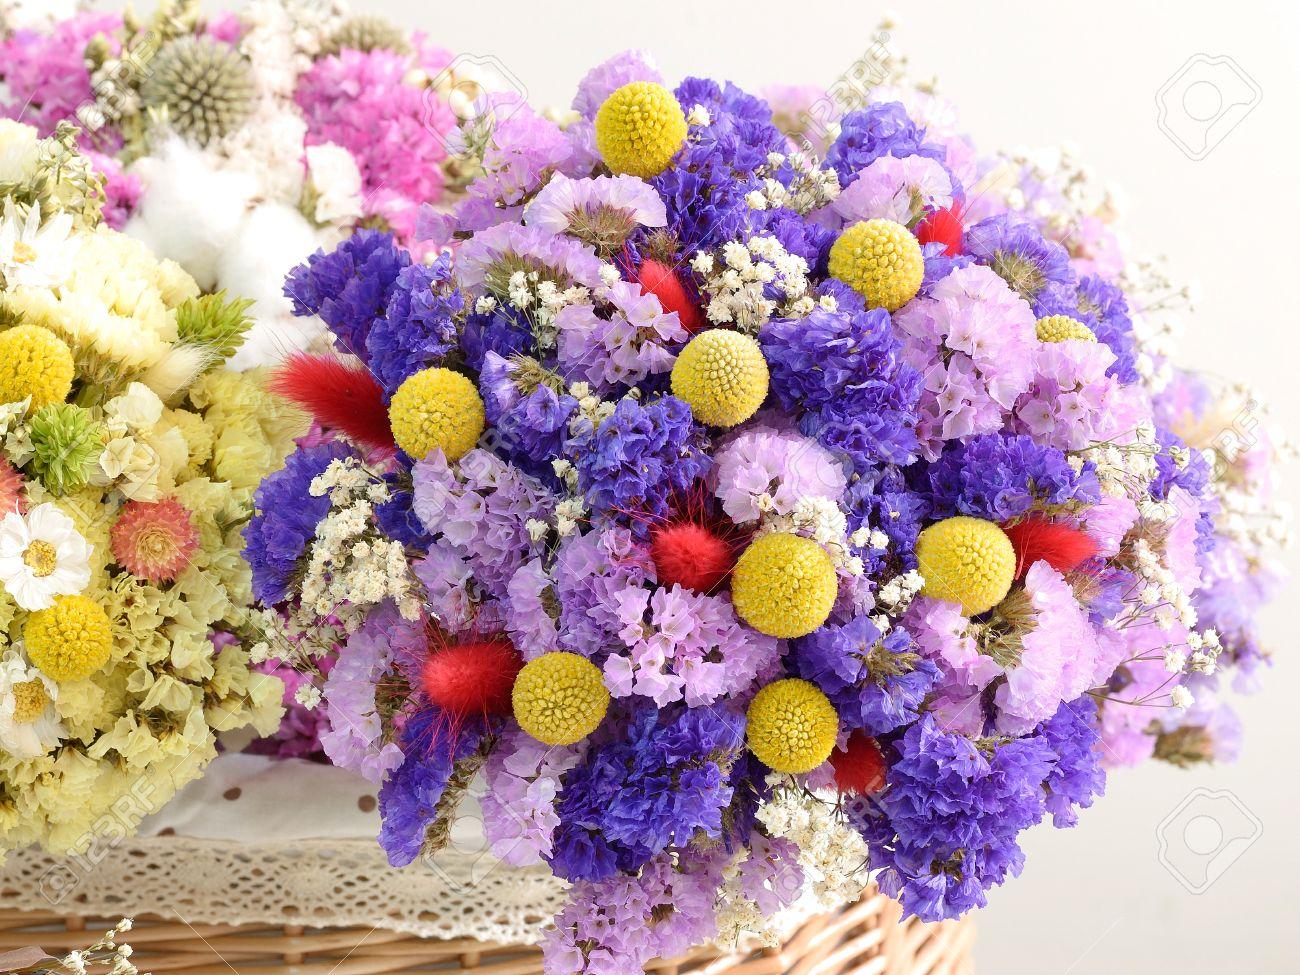 Mazzo Di Fiori Secchi.Multiple Dried Flowers Tied With Bouquets Put In The Basket Stock